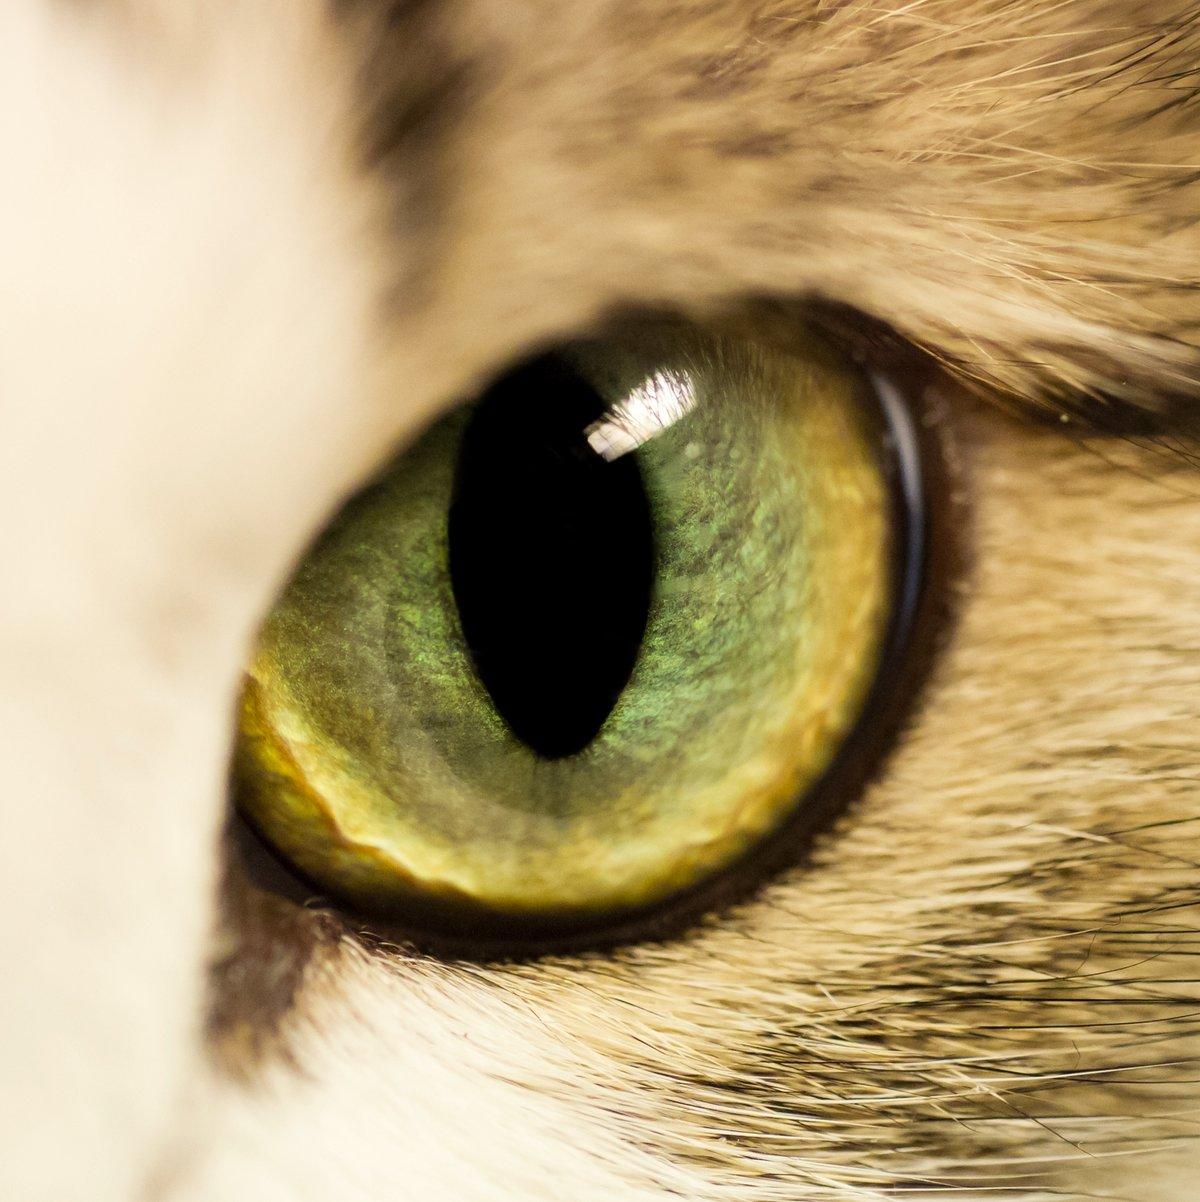 образом картинка про кота с глазами планшета